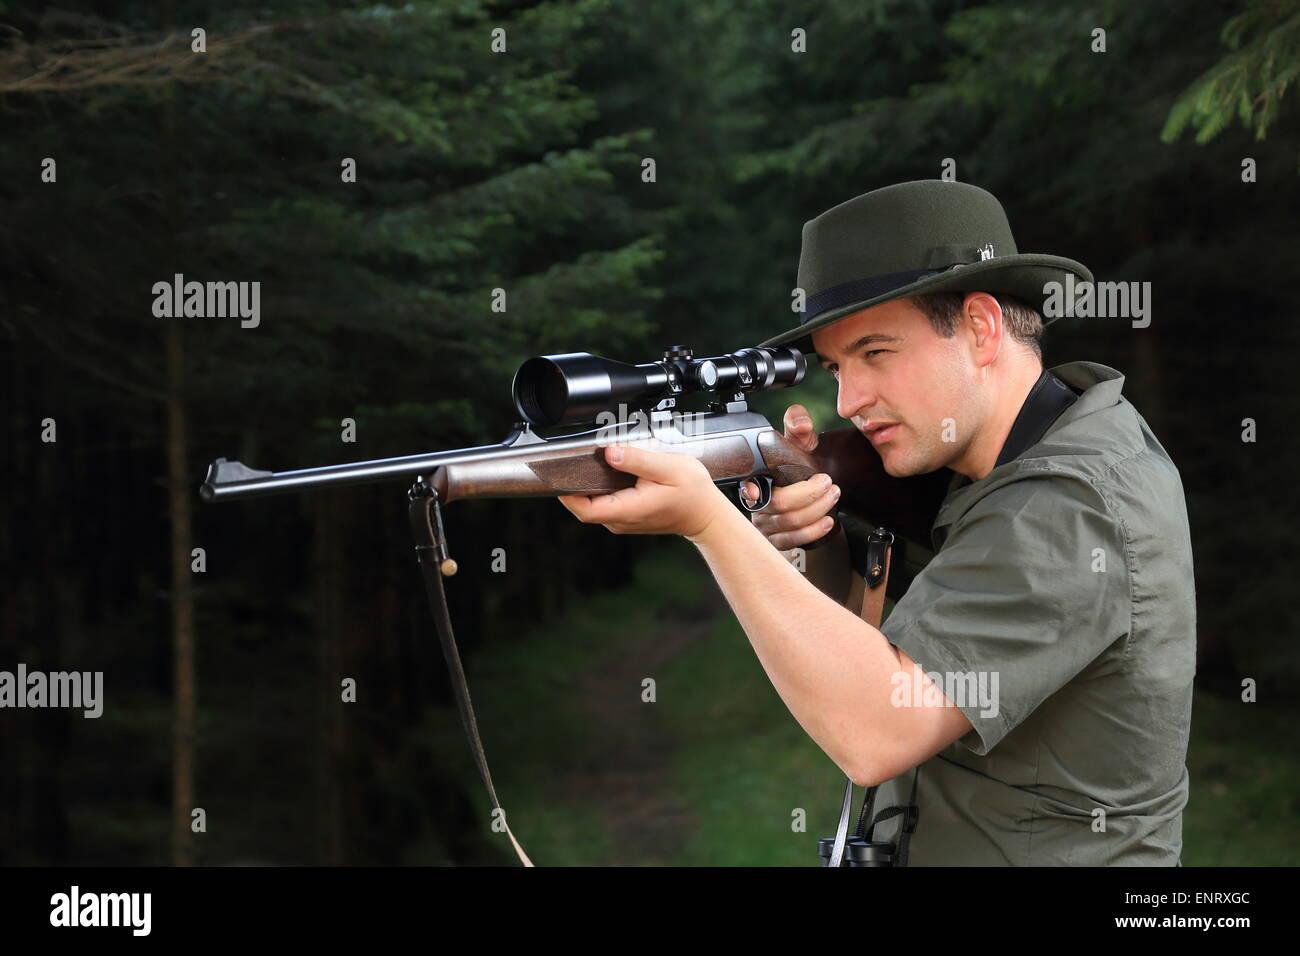 A Hunter shooting with his rifle - Stock Image